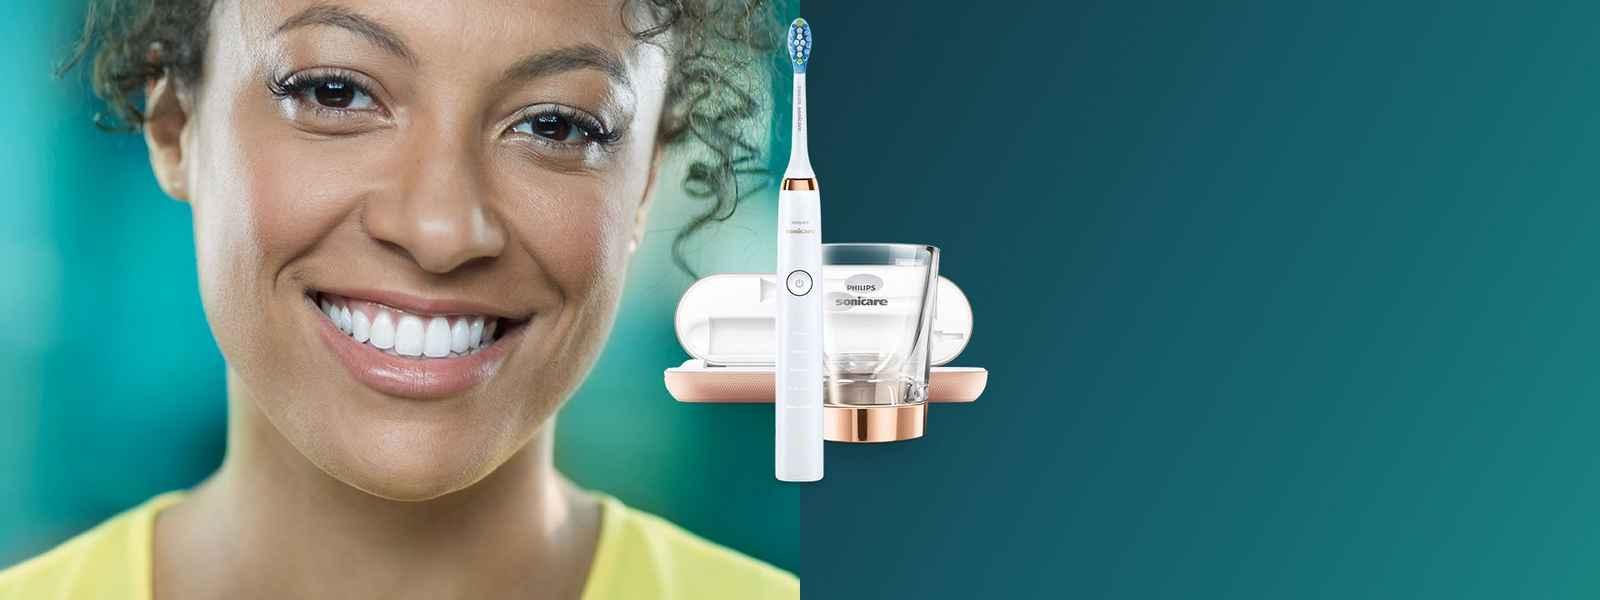 Philips Sonicare Zahnpflege